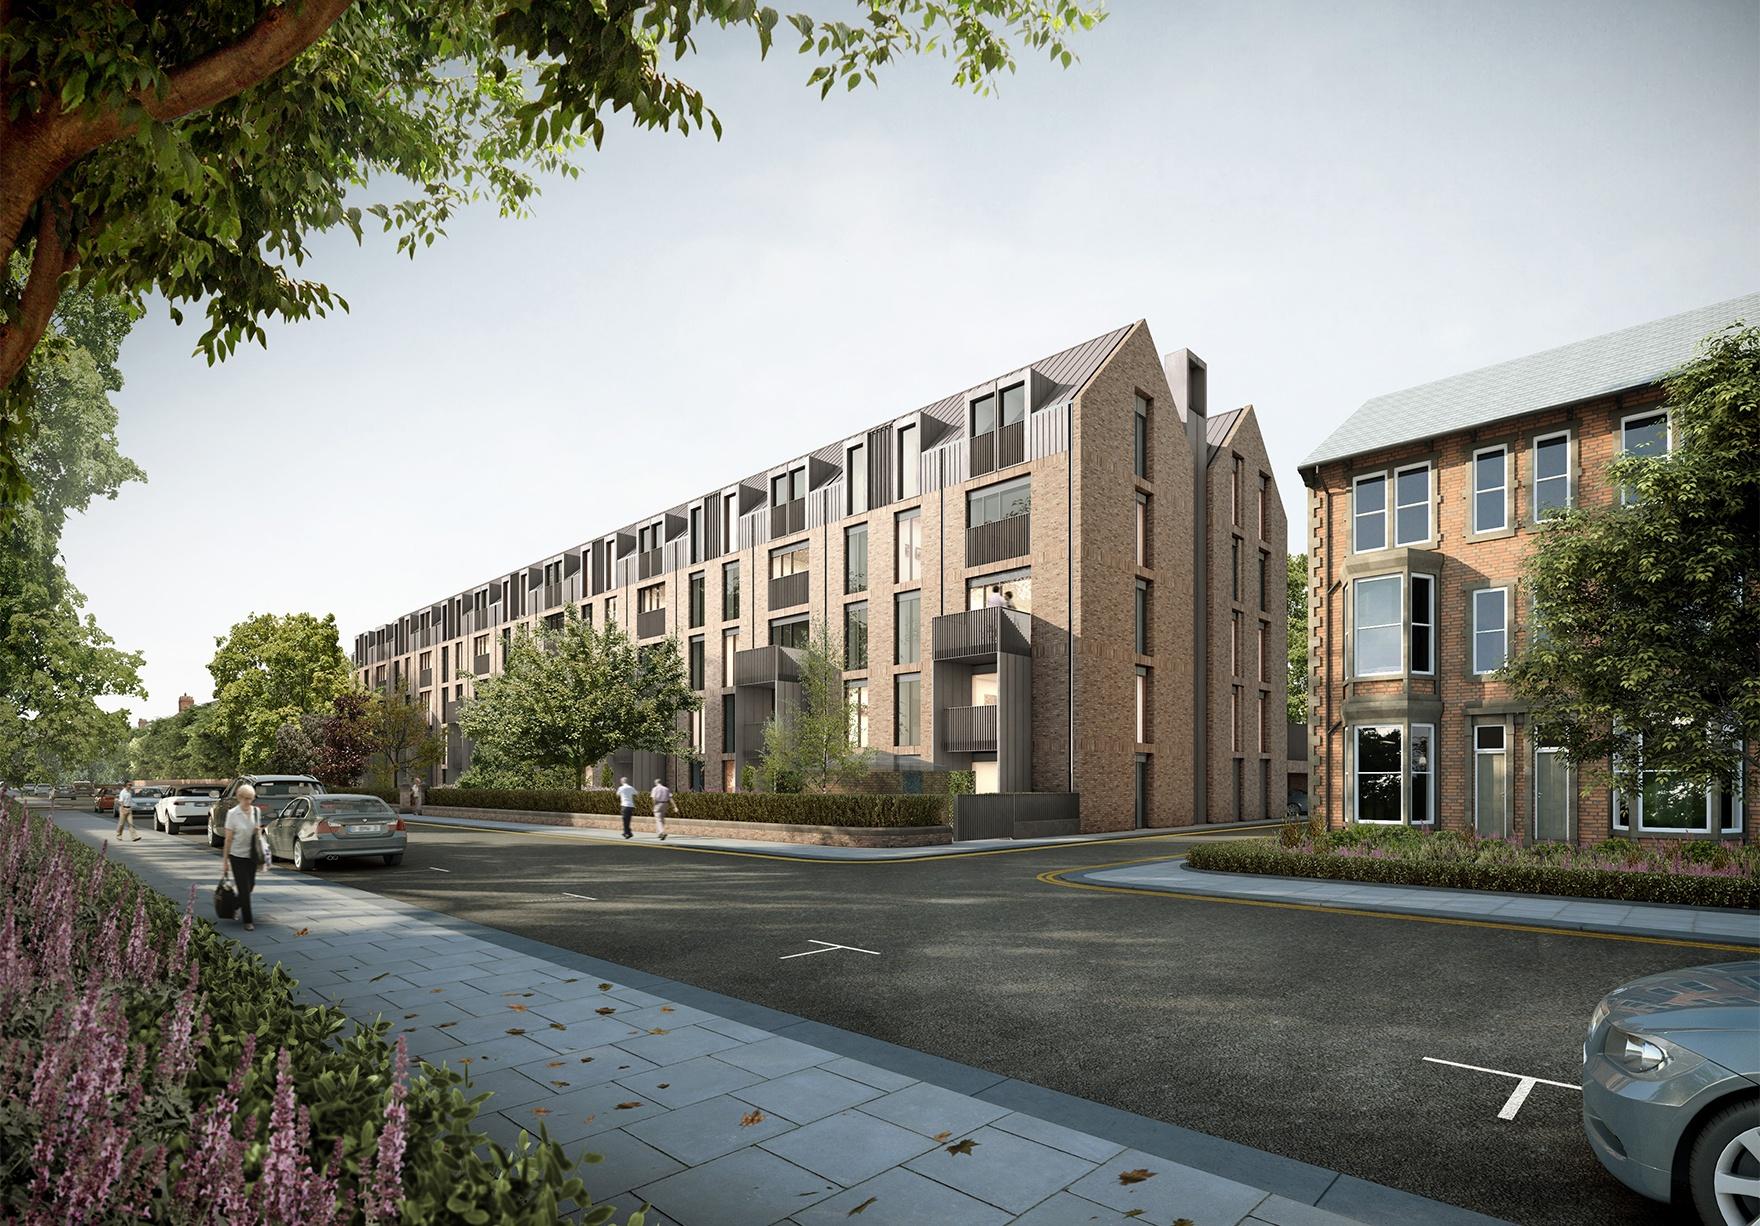 eskdale-terrace-retirement-living-pegasuslife-newcastle-residential-view-from-eskdale-terrace-lh